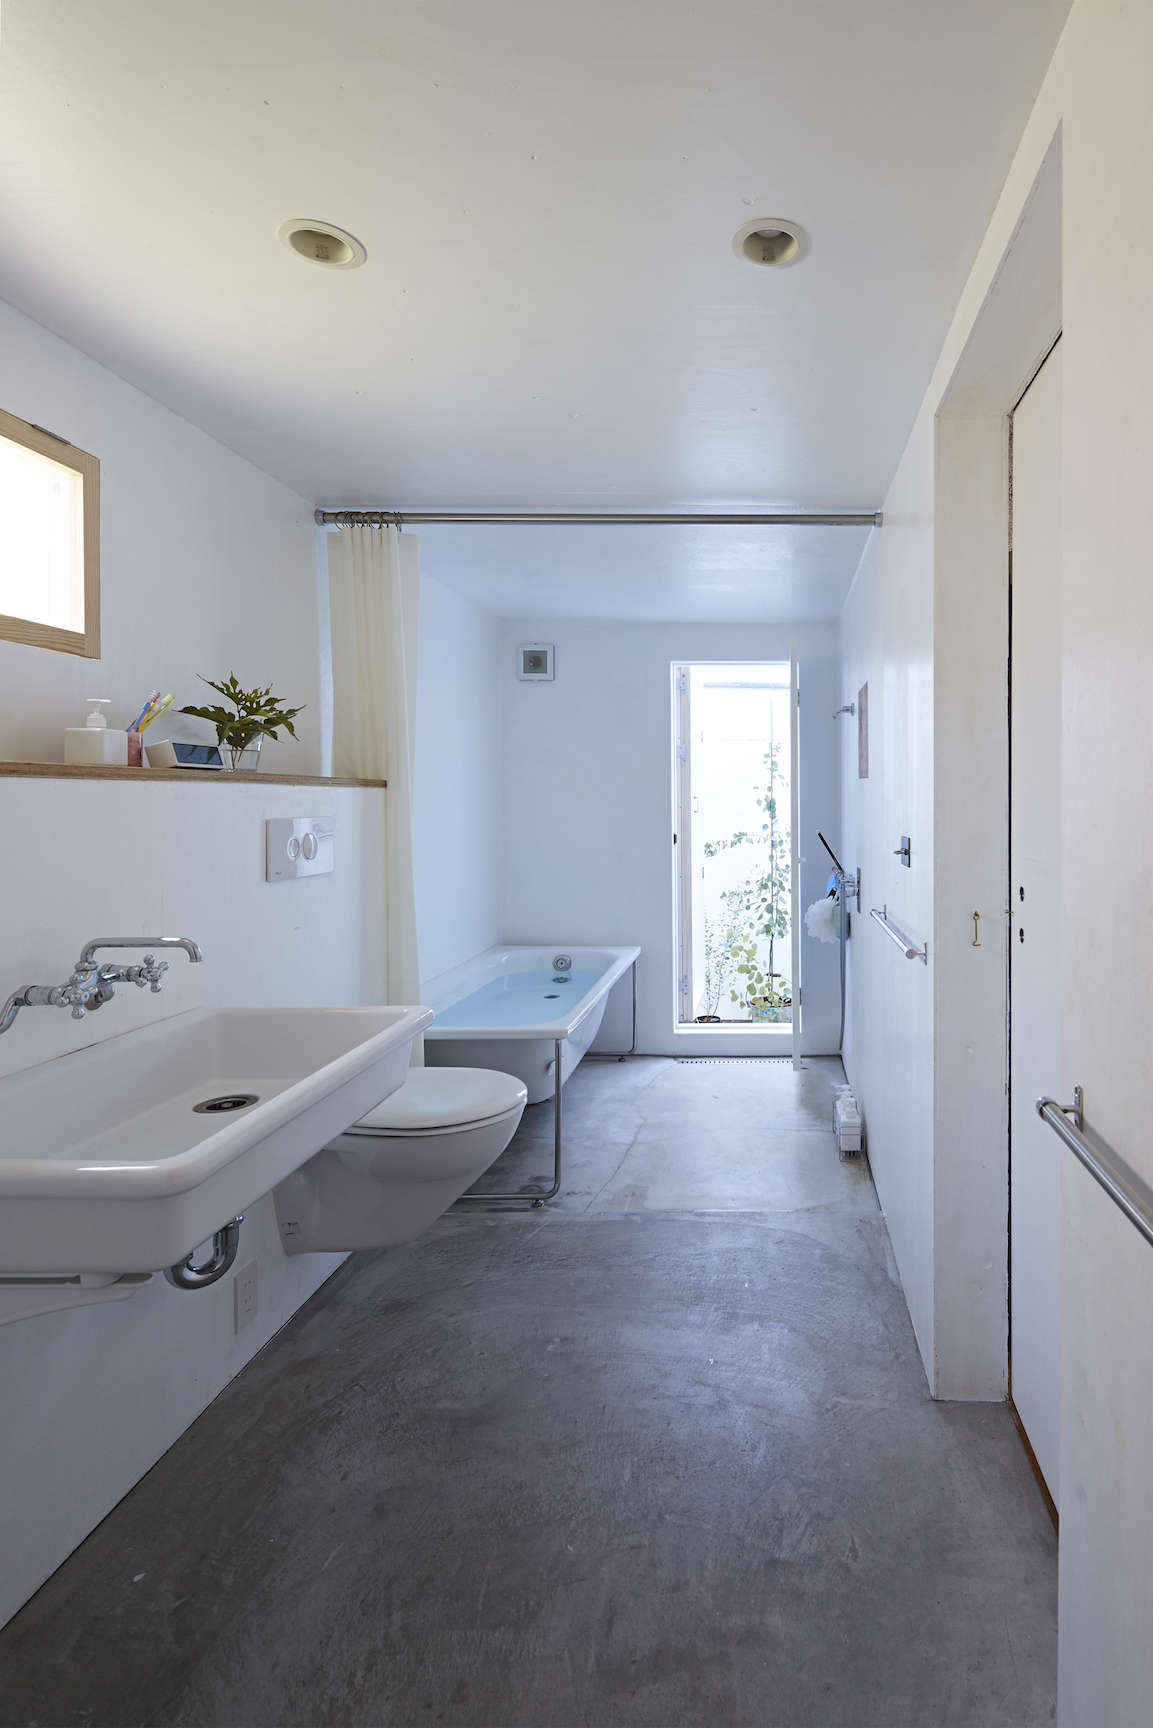 Fine Japanese Bath Company Ensign - Bathtub Ideas - dilata.info